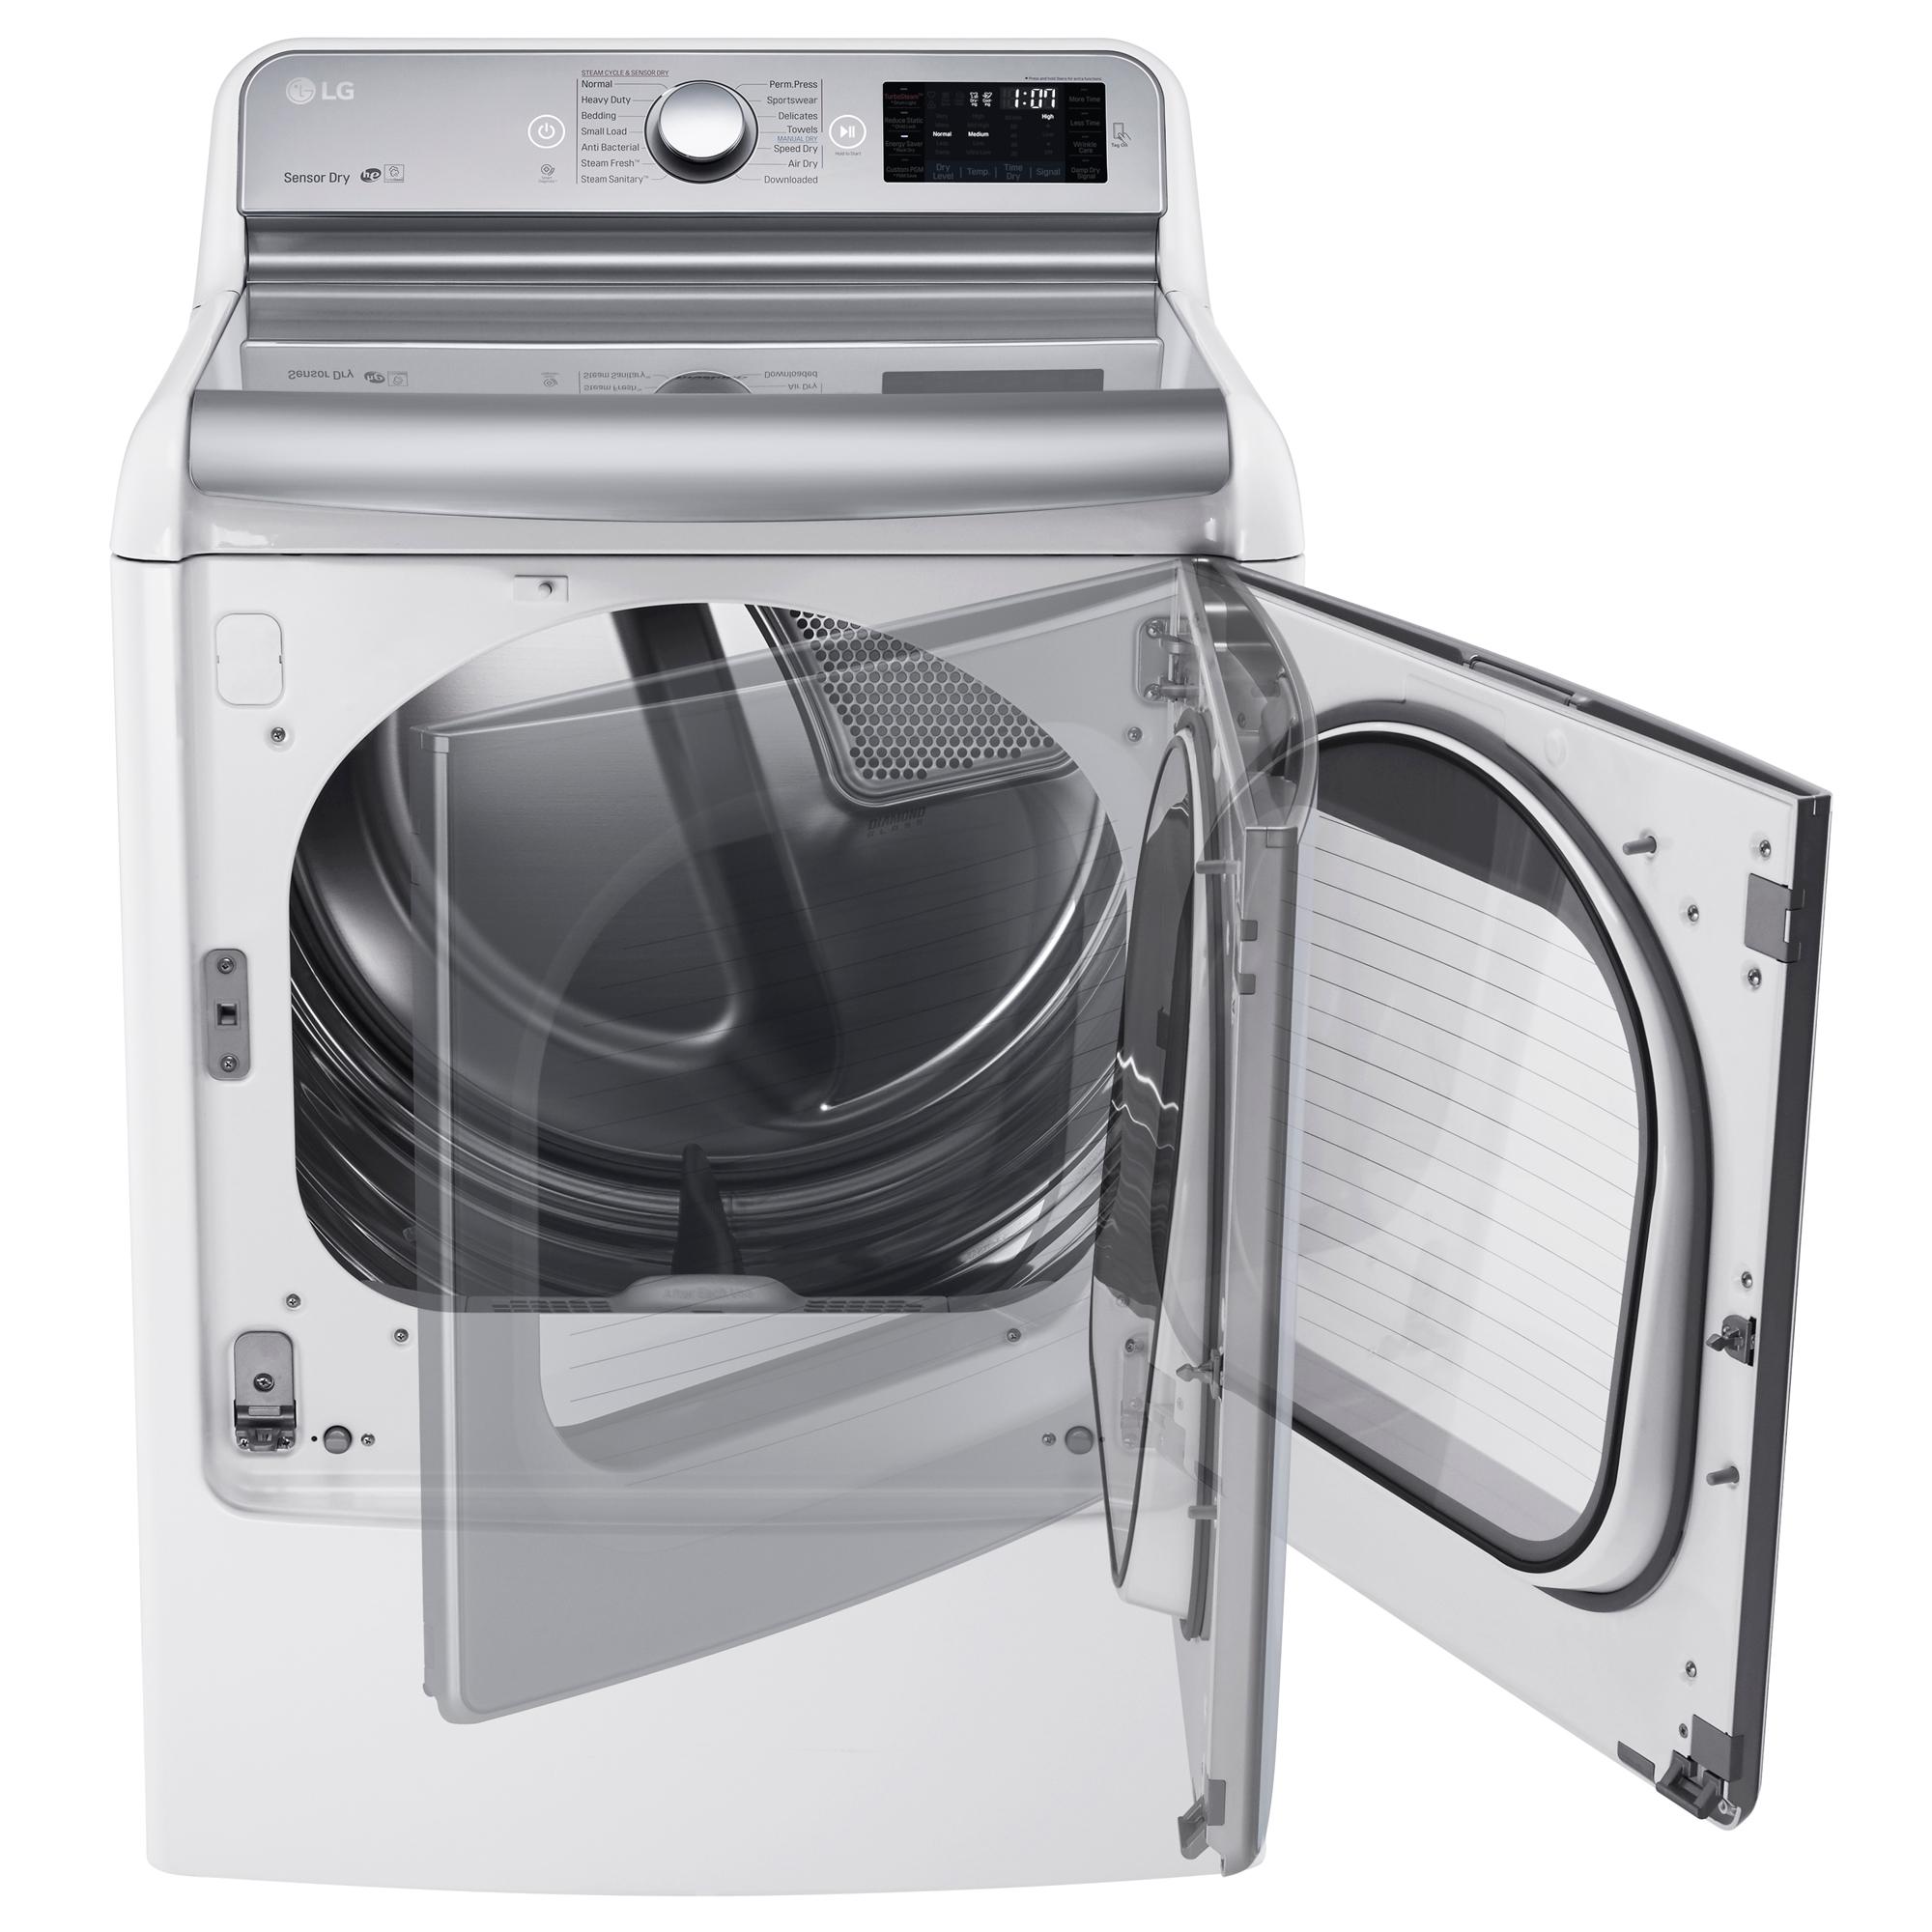 LG DLGX7701WE 9.0 cu.ft. TurboSteam™ Dryer w/LG EasyLoad™ Door – White